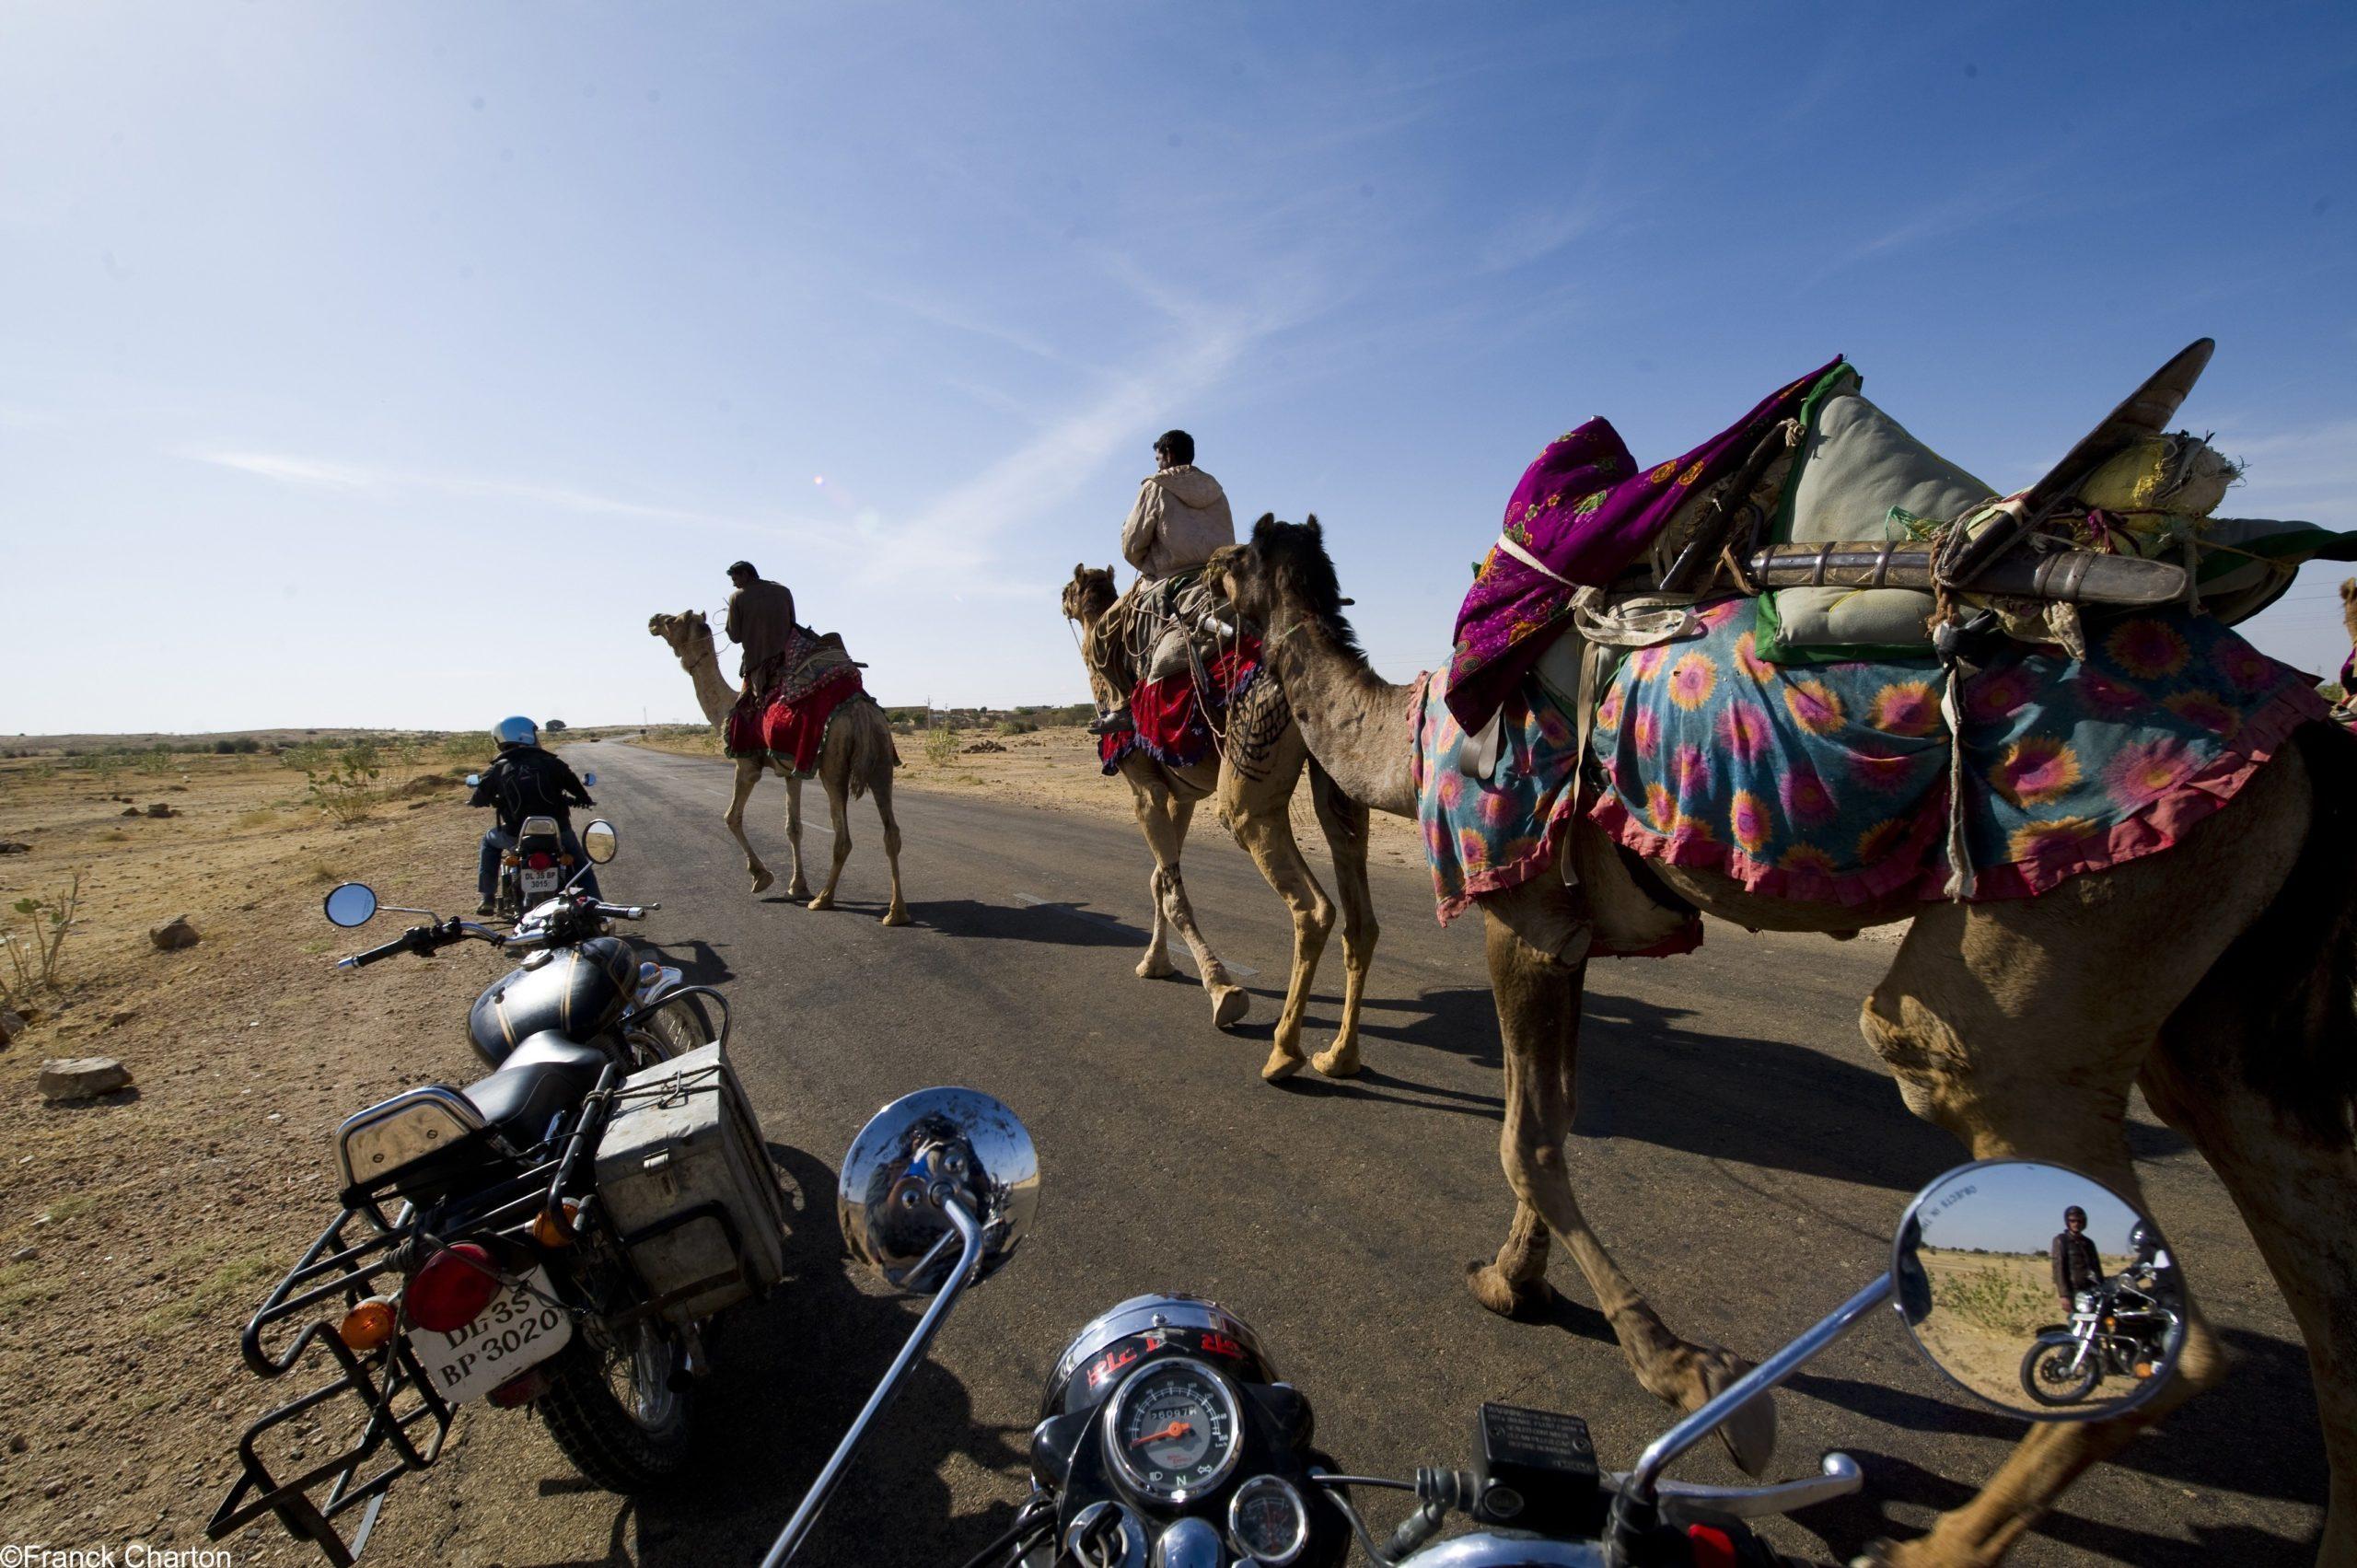 Motorrad-Roadtrip Nordindien - Das Land der Maharadschas